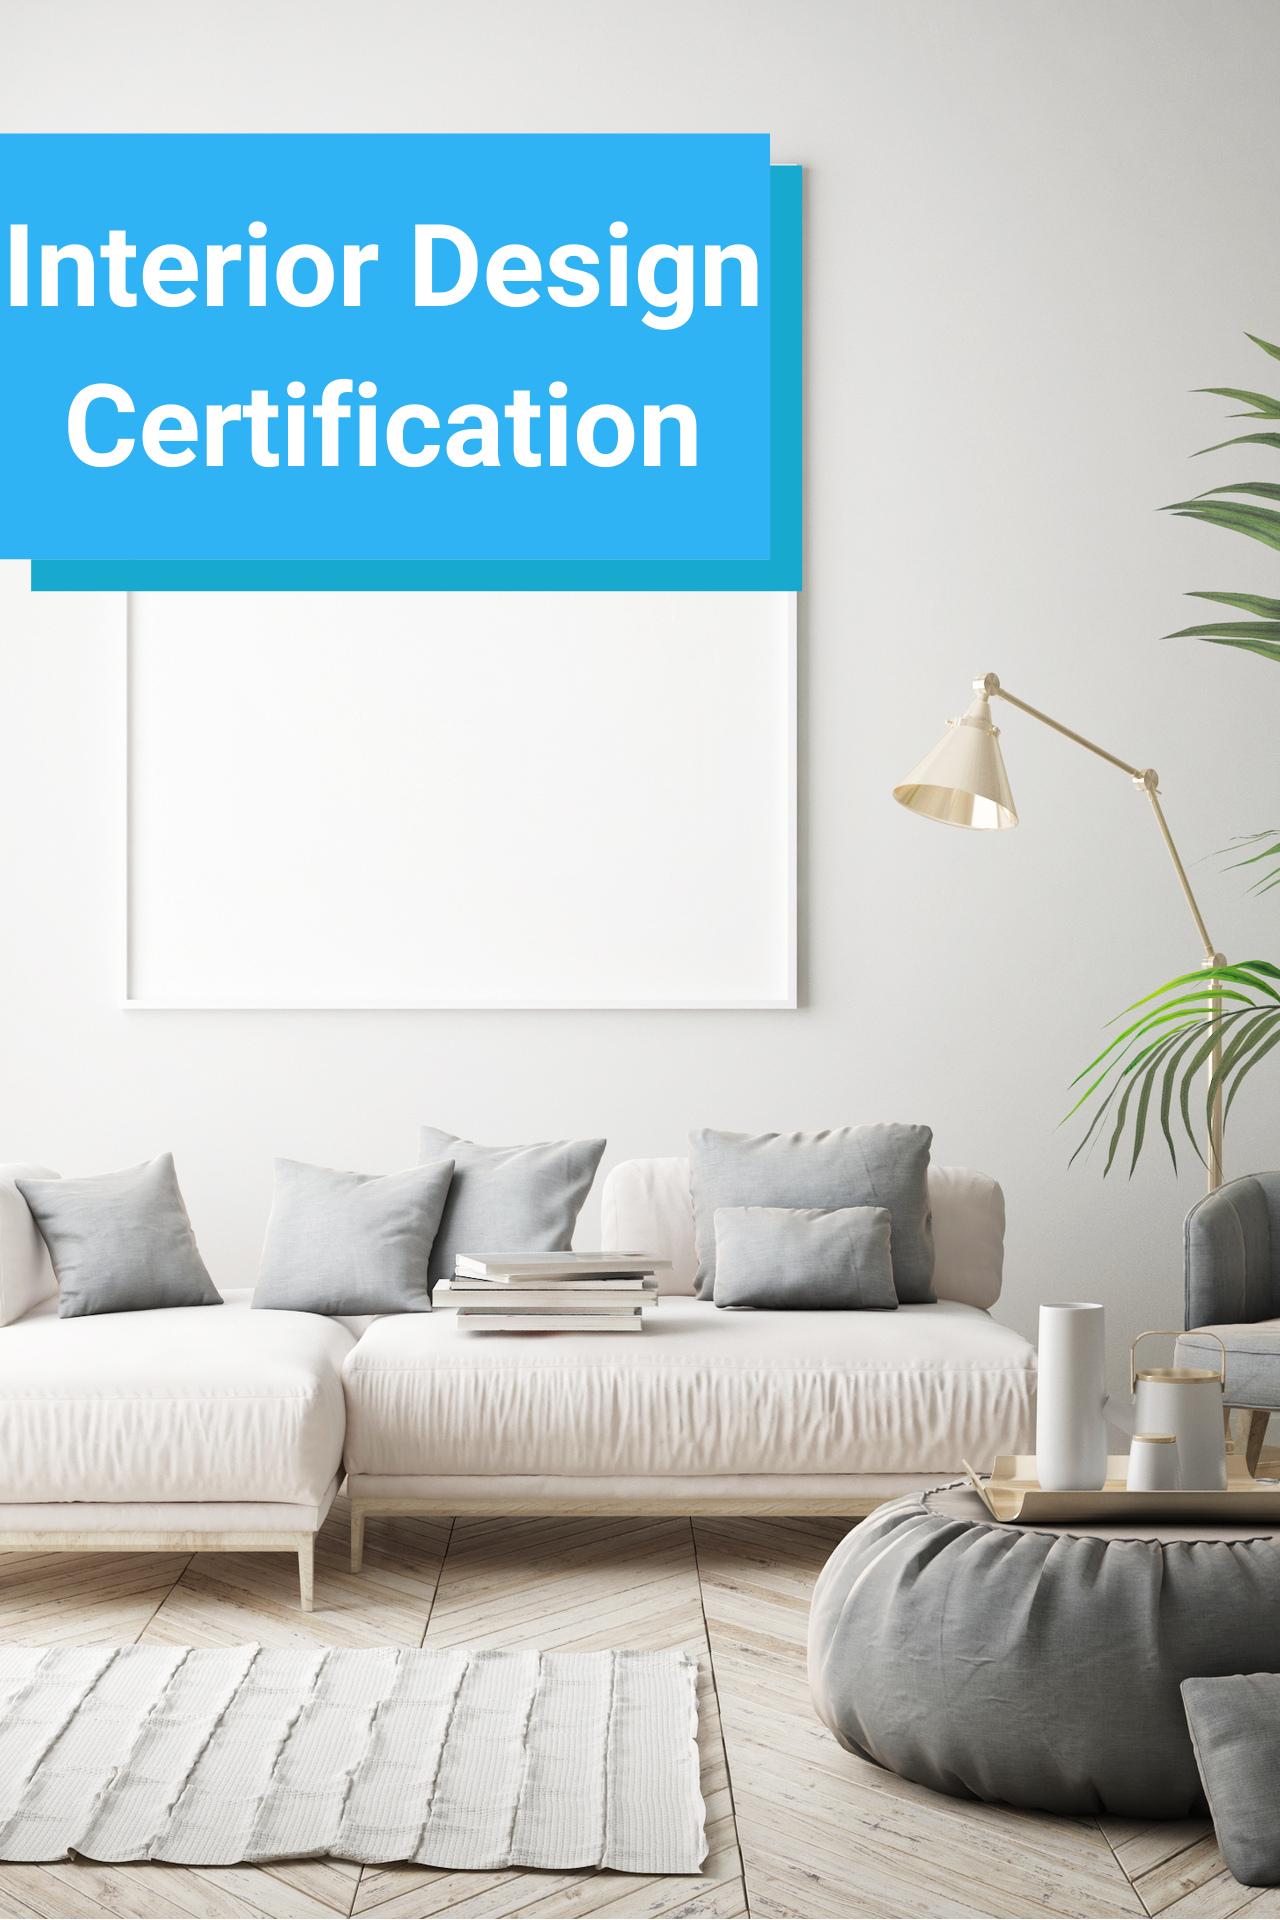 Online Interior Design Certification - $26 USD